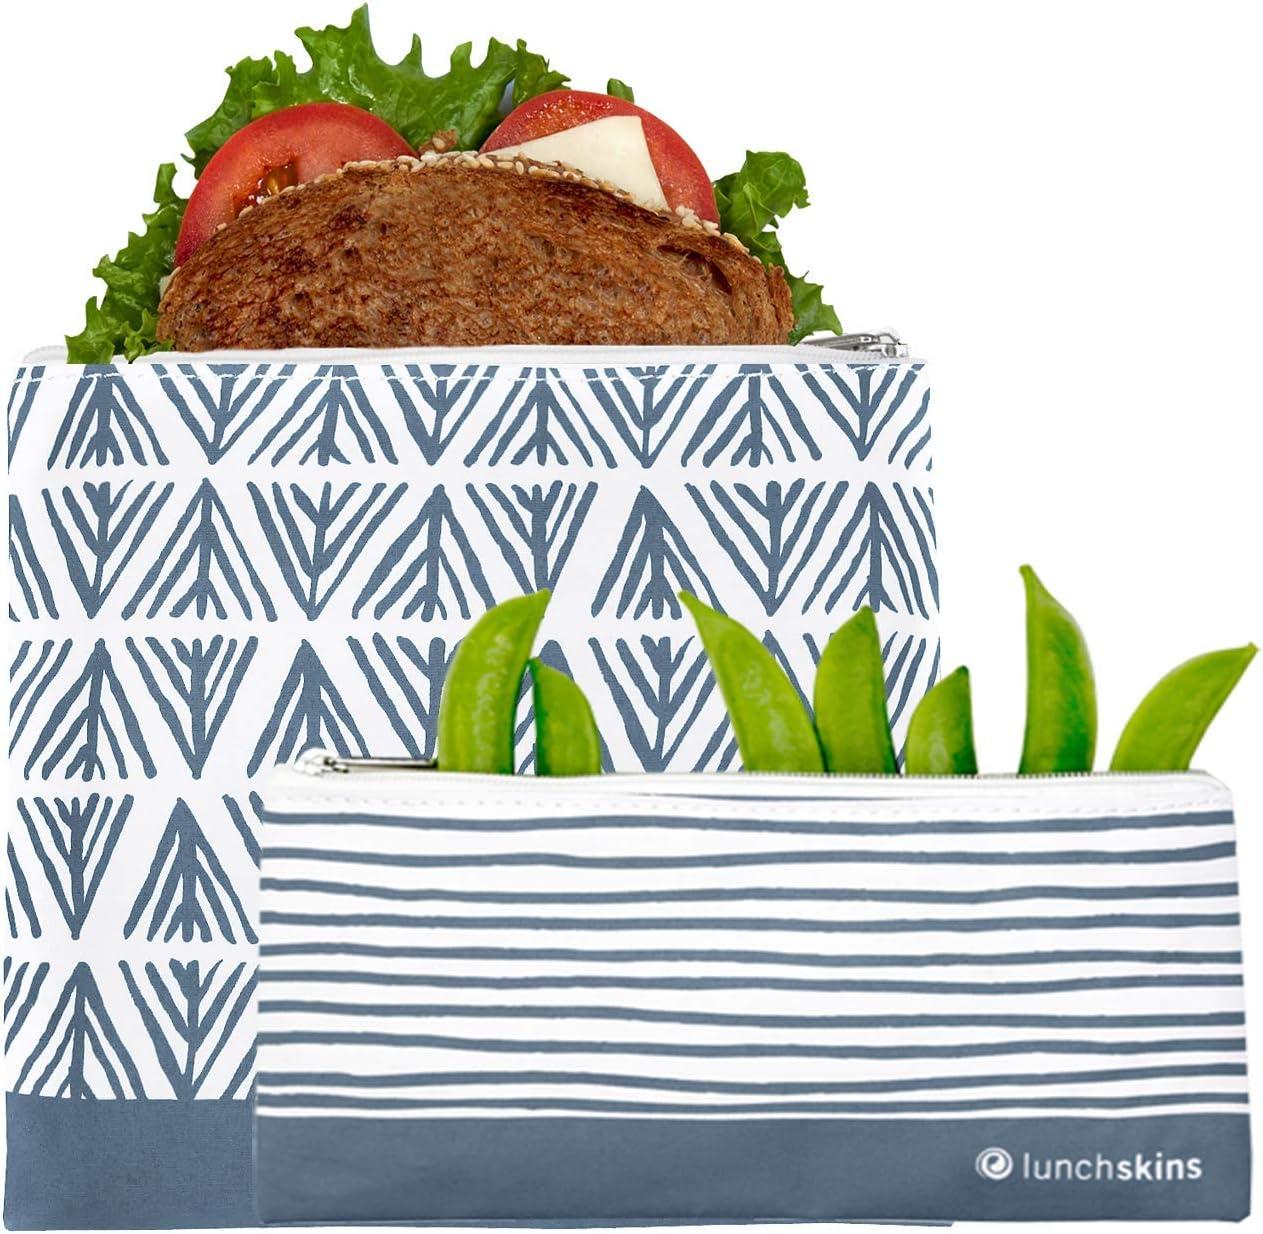 Lunchskins Reusable 2 Piece Zippered Food Storage Bag Set, 1 Sandwich Bag + 1 Snack Bag, Blue Geometric